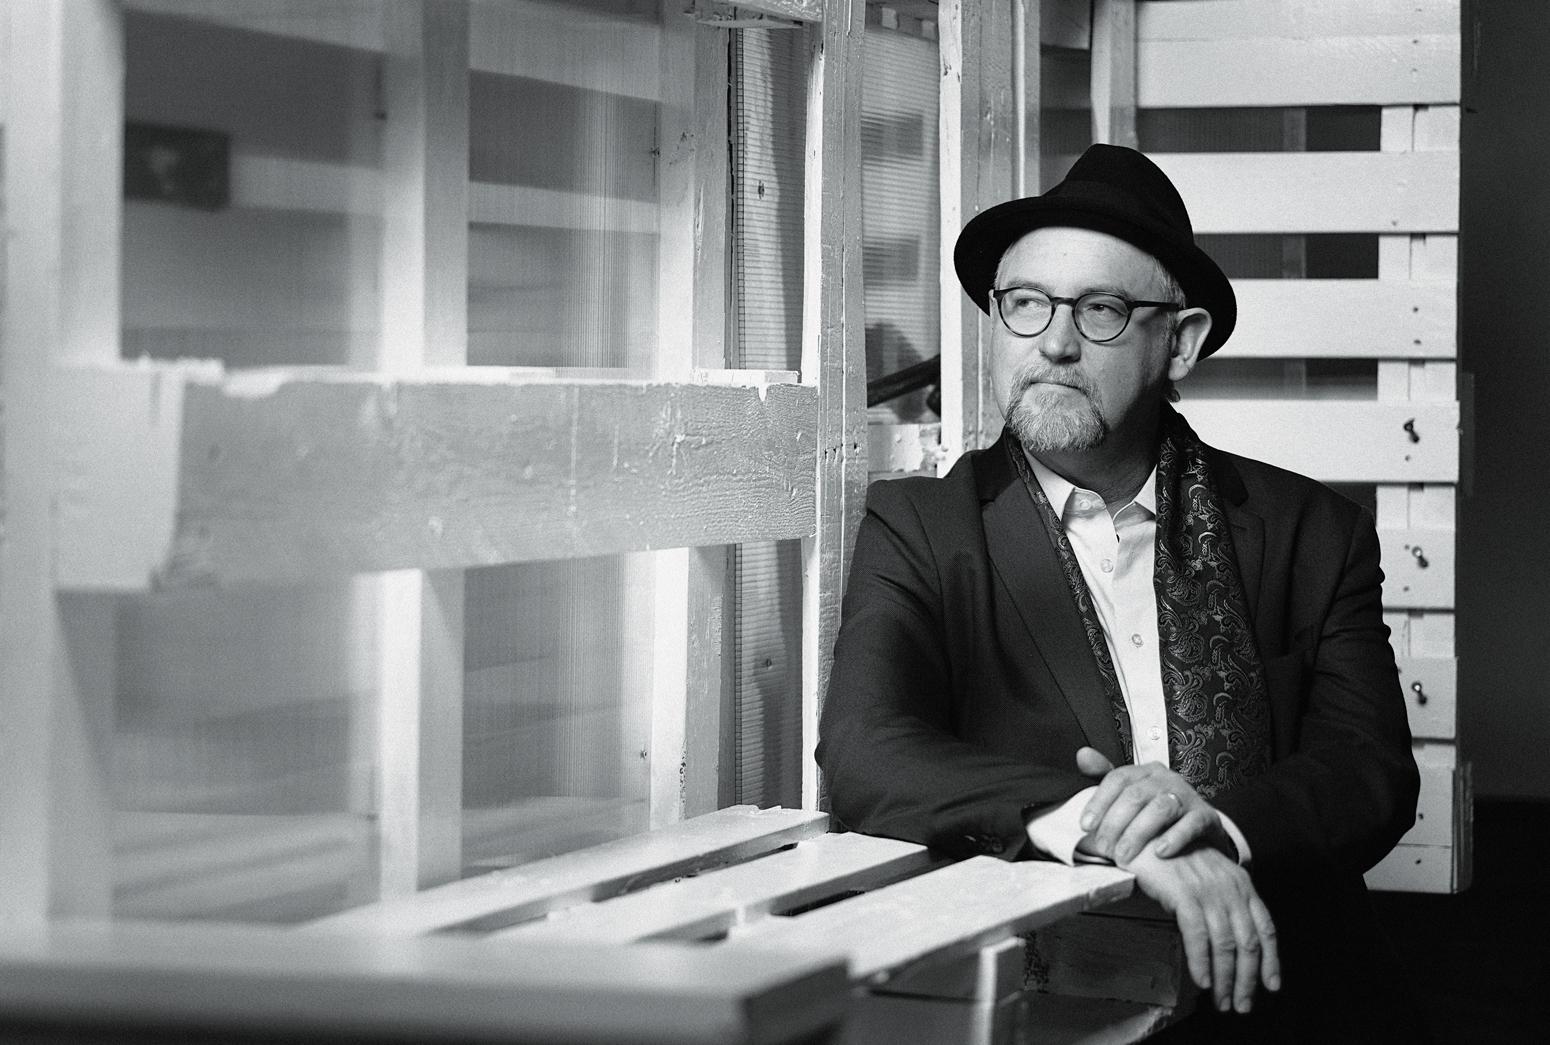 Vern Thiessen, black and white